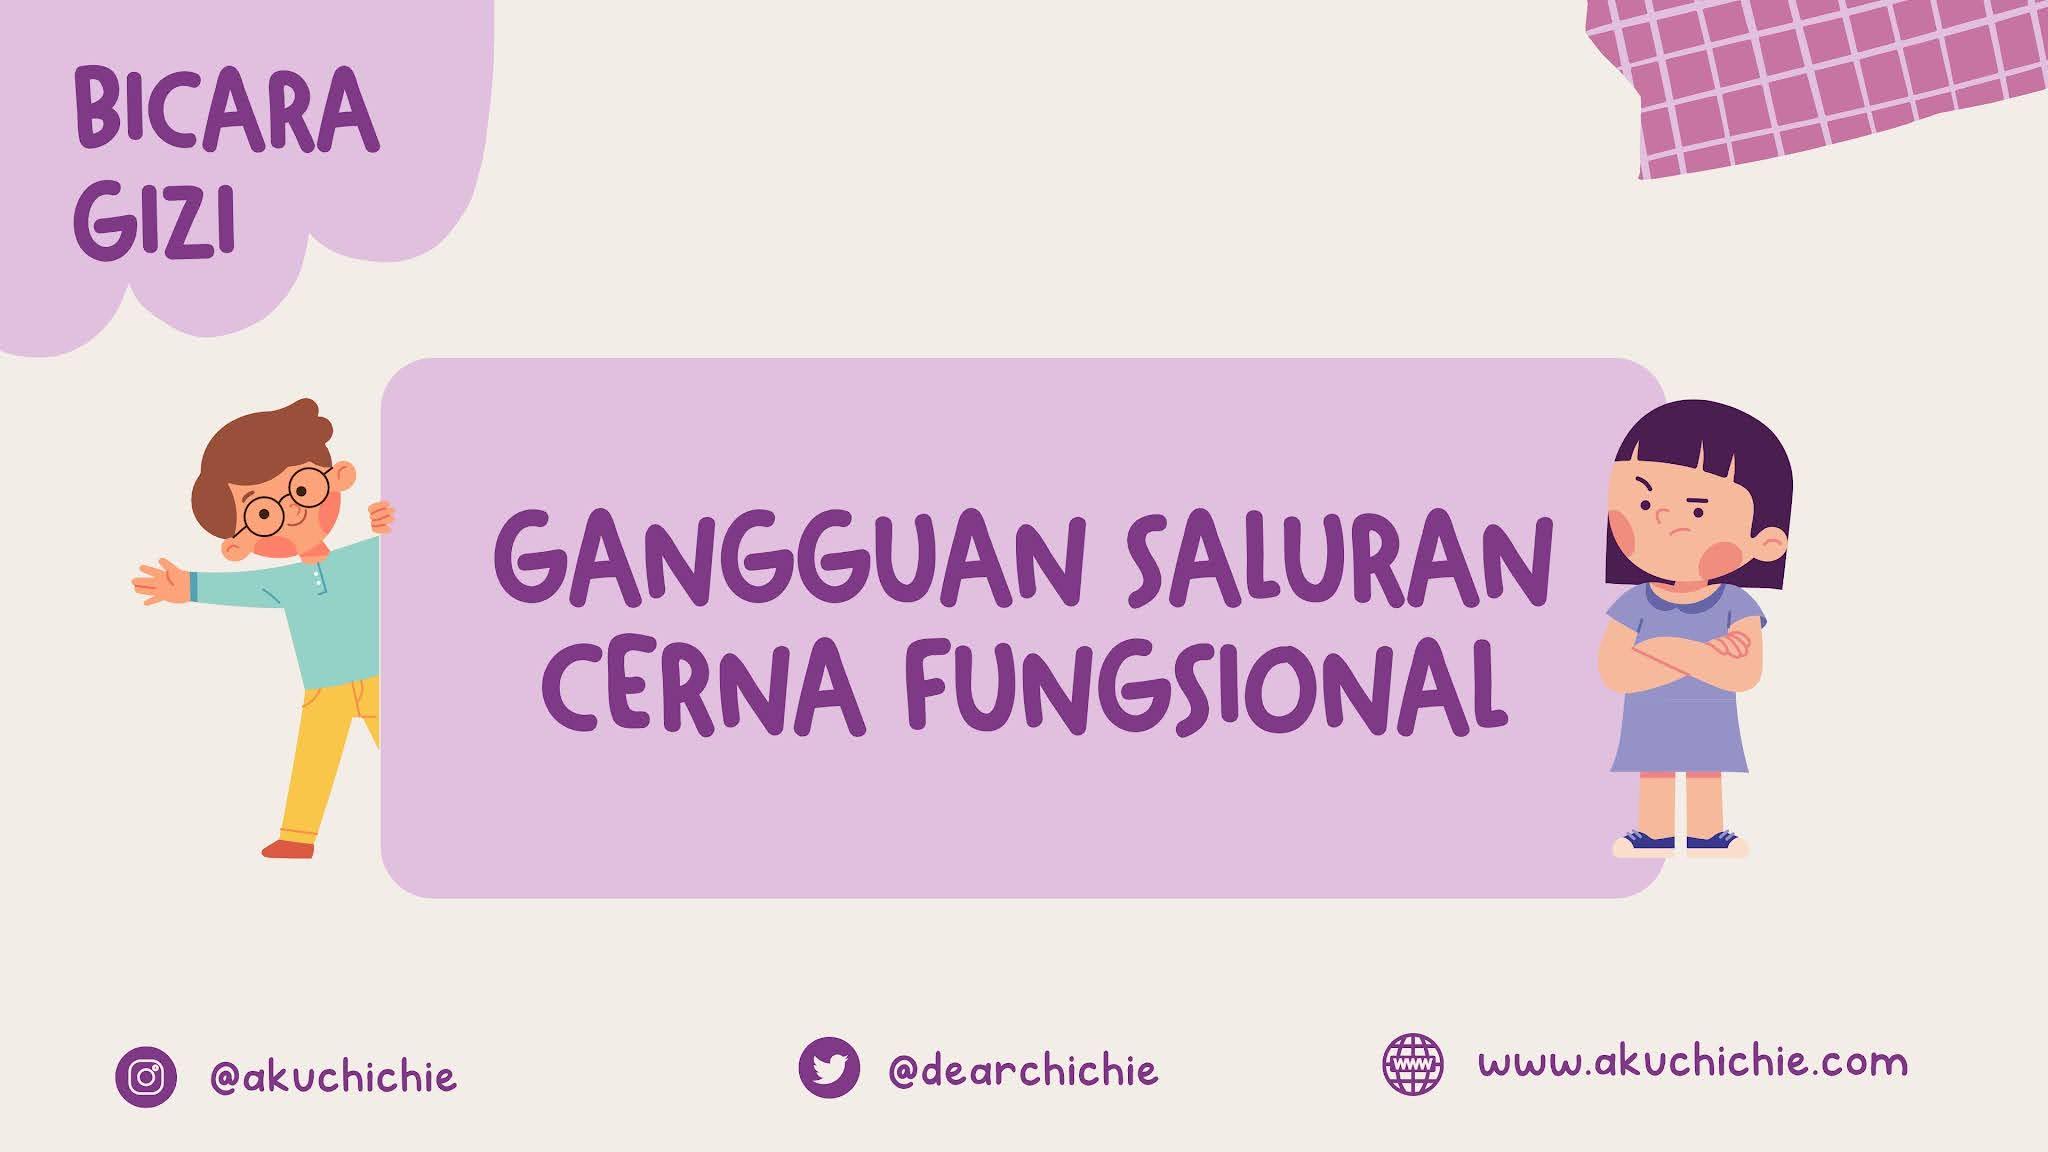 bicara gizi - gangguan saluran cerna fungsional